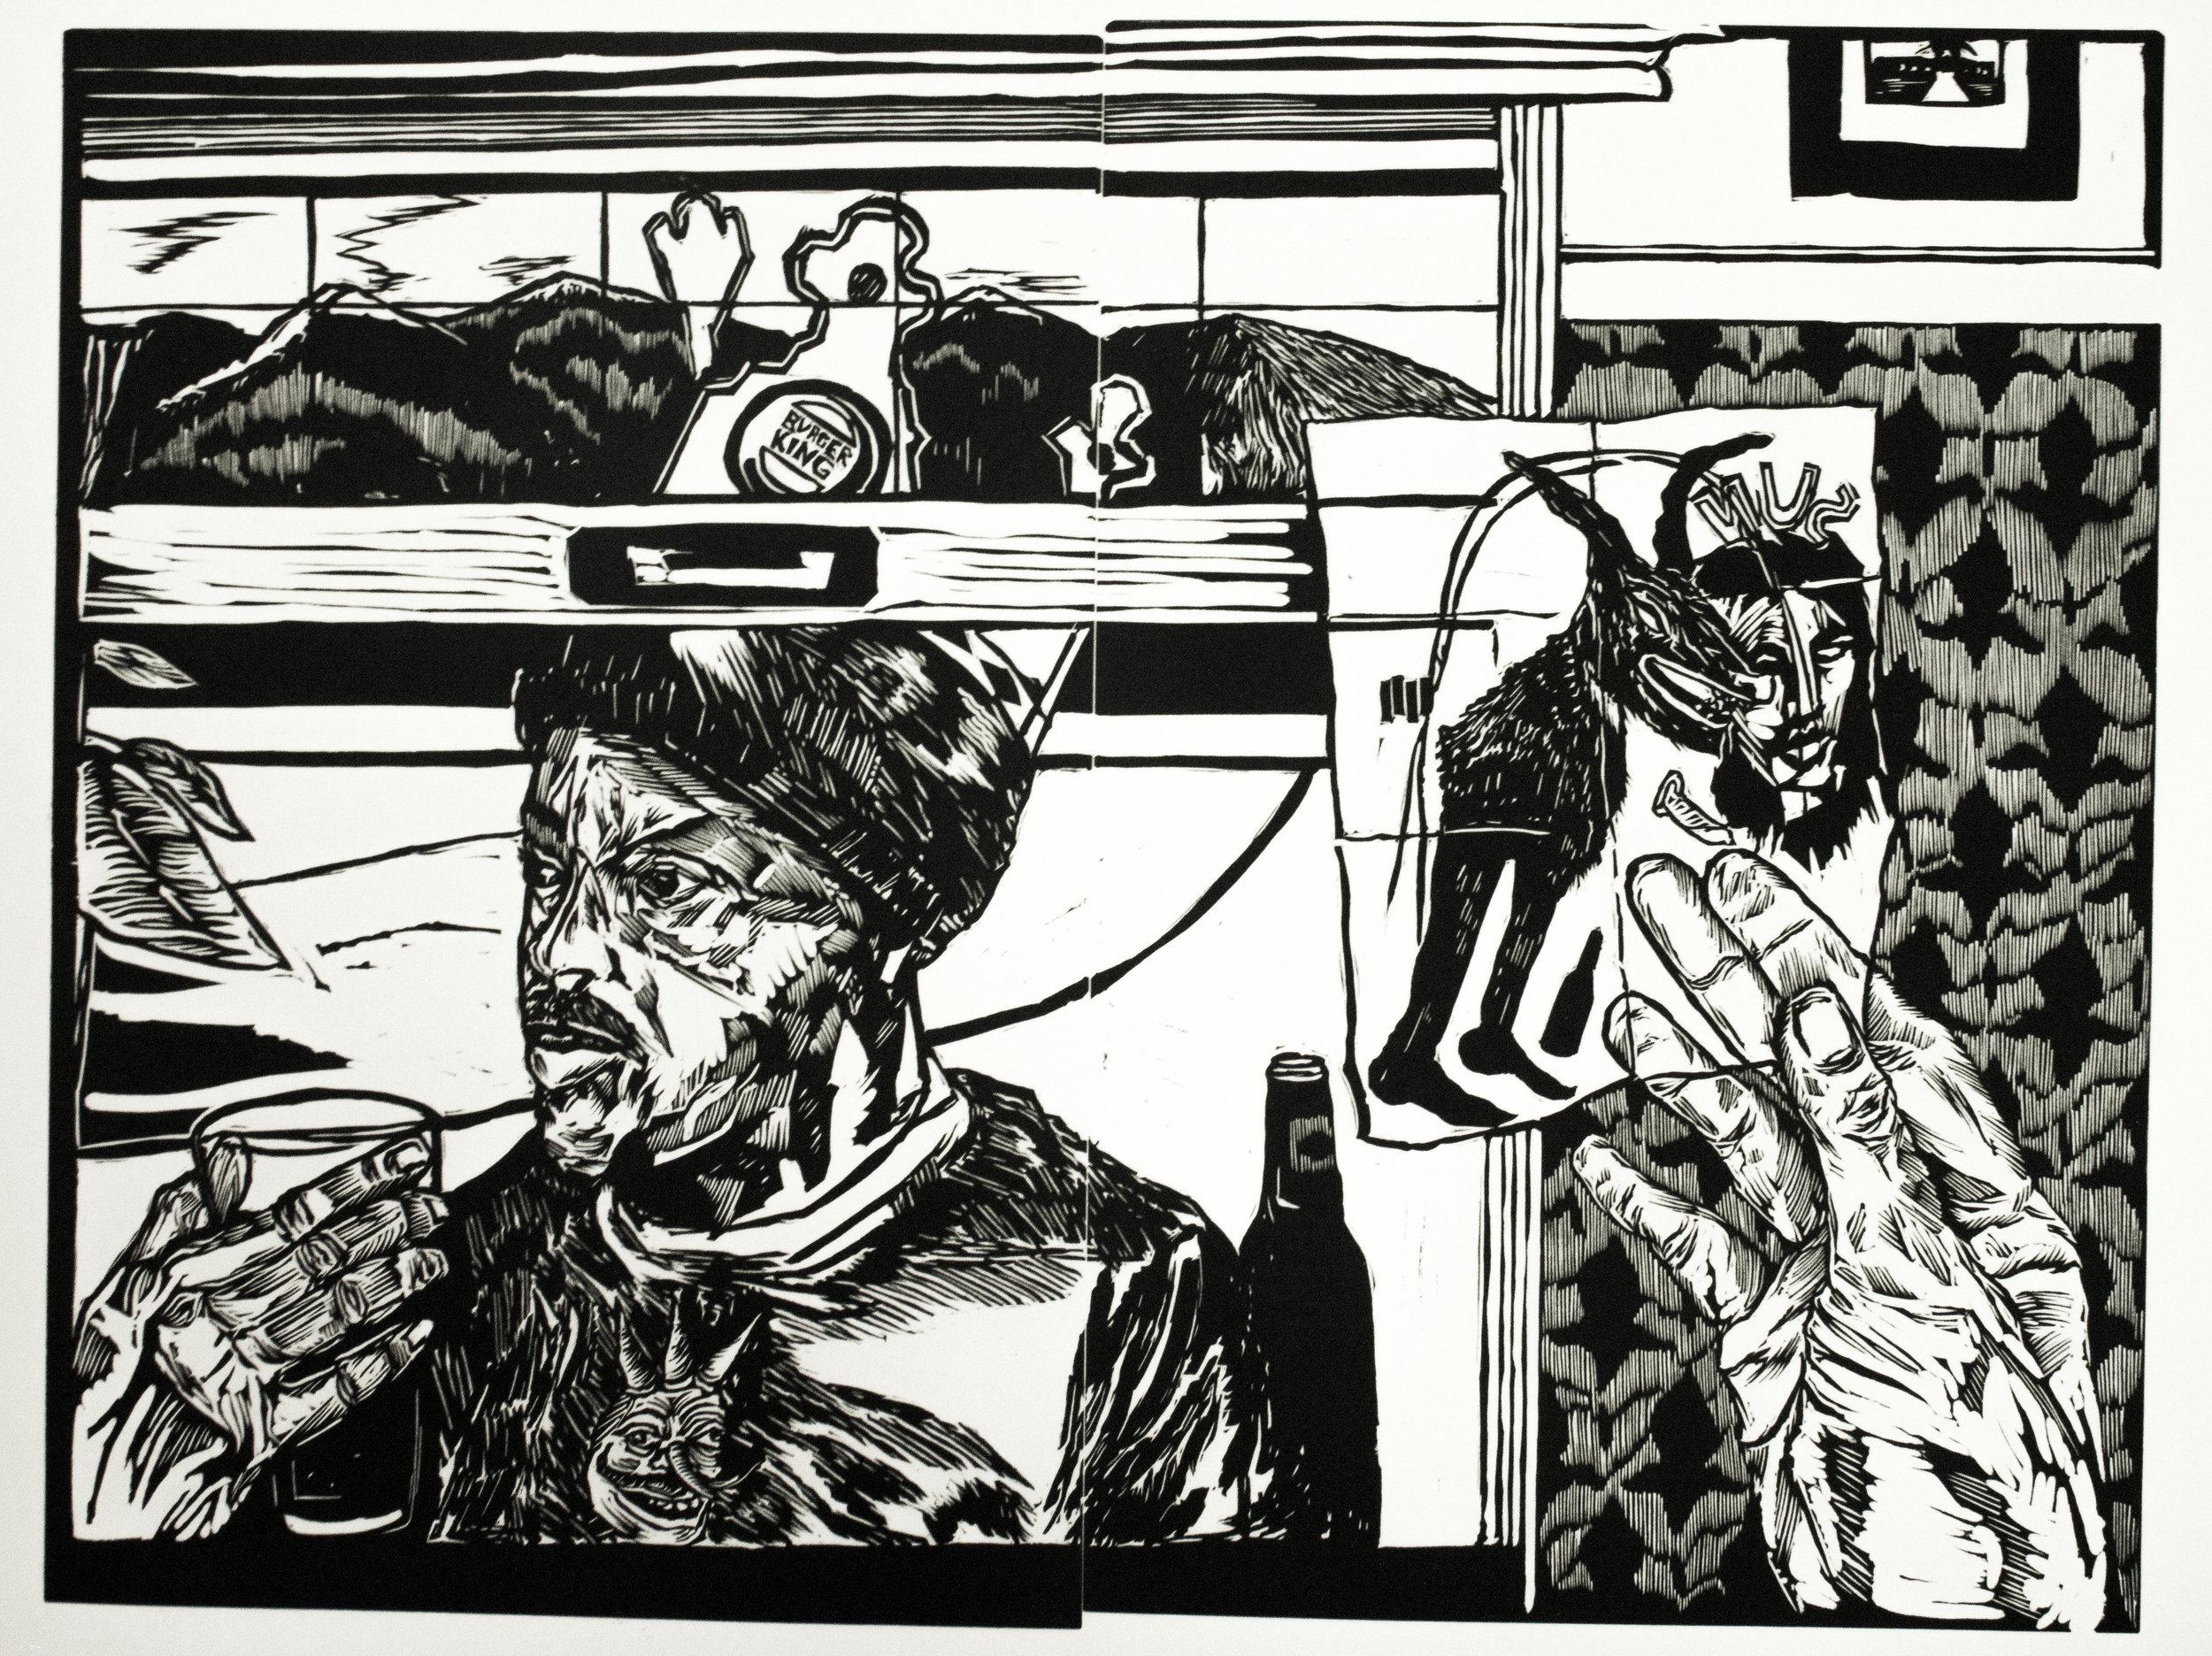 Emmett Merrill,  What'd I Do? , Relief print, 22 x 30, $250